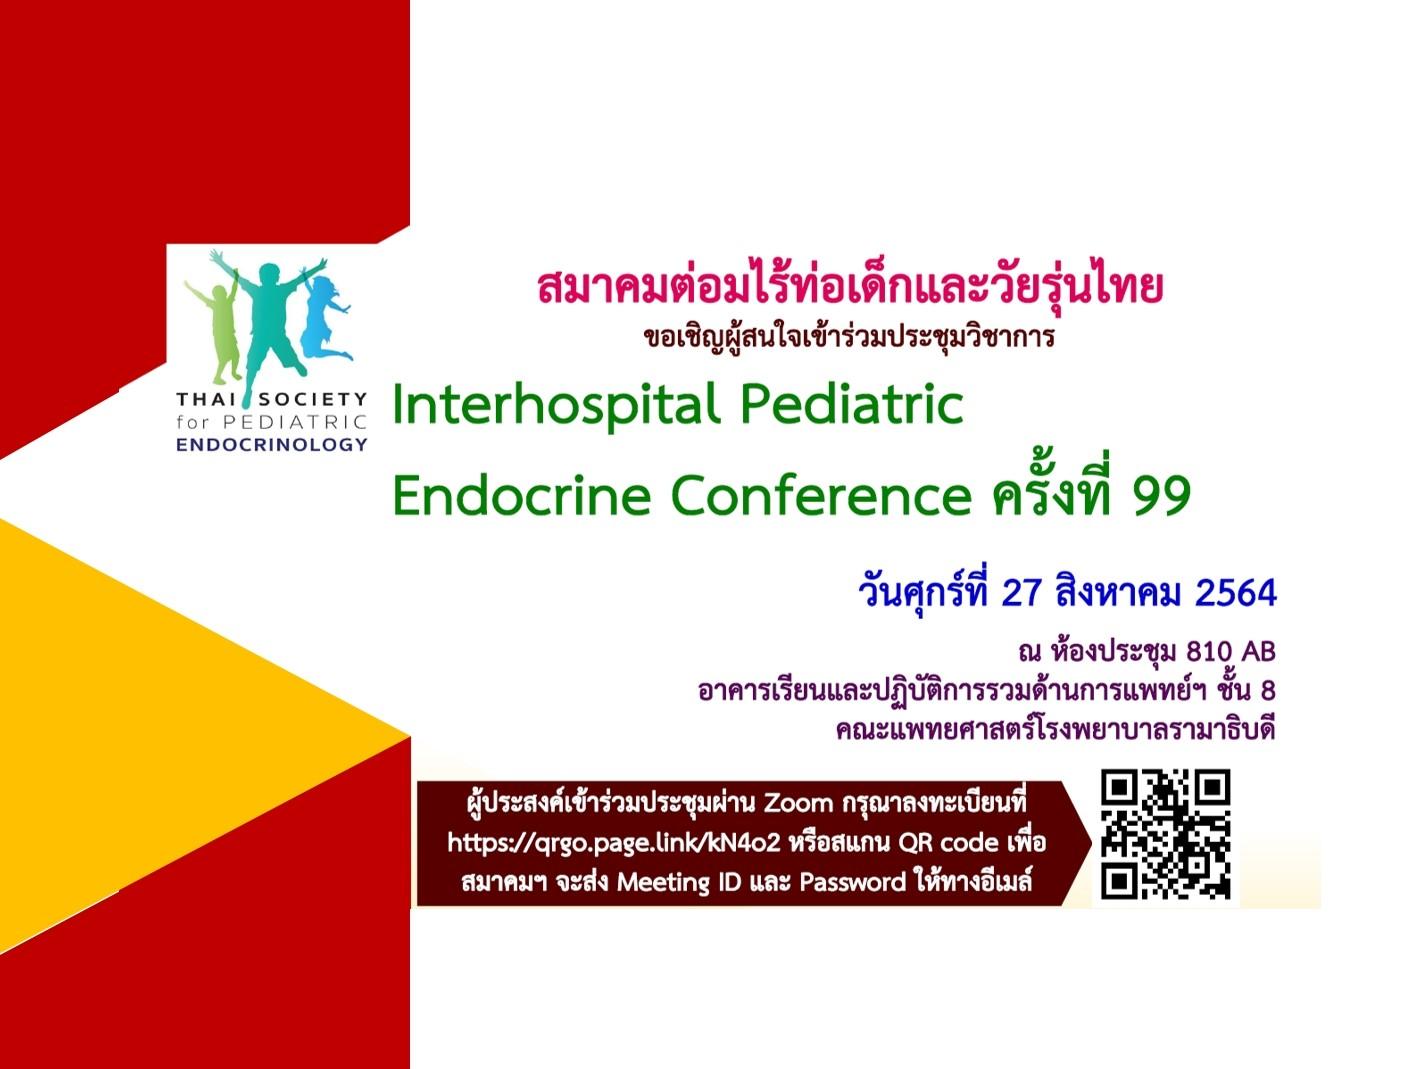 Interhospital Pediatric Endocrine Conference ครั้งที่ 99